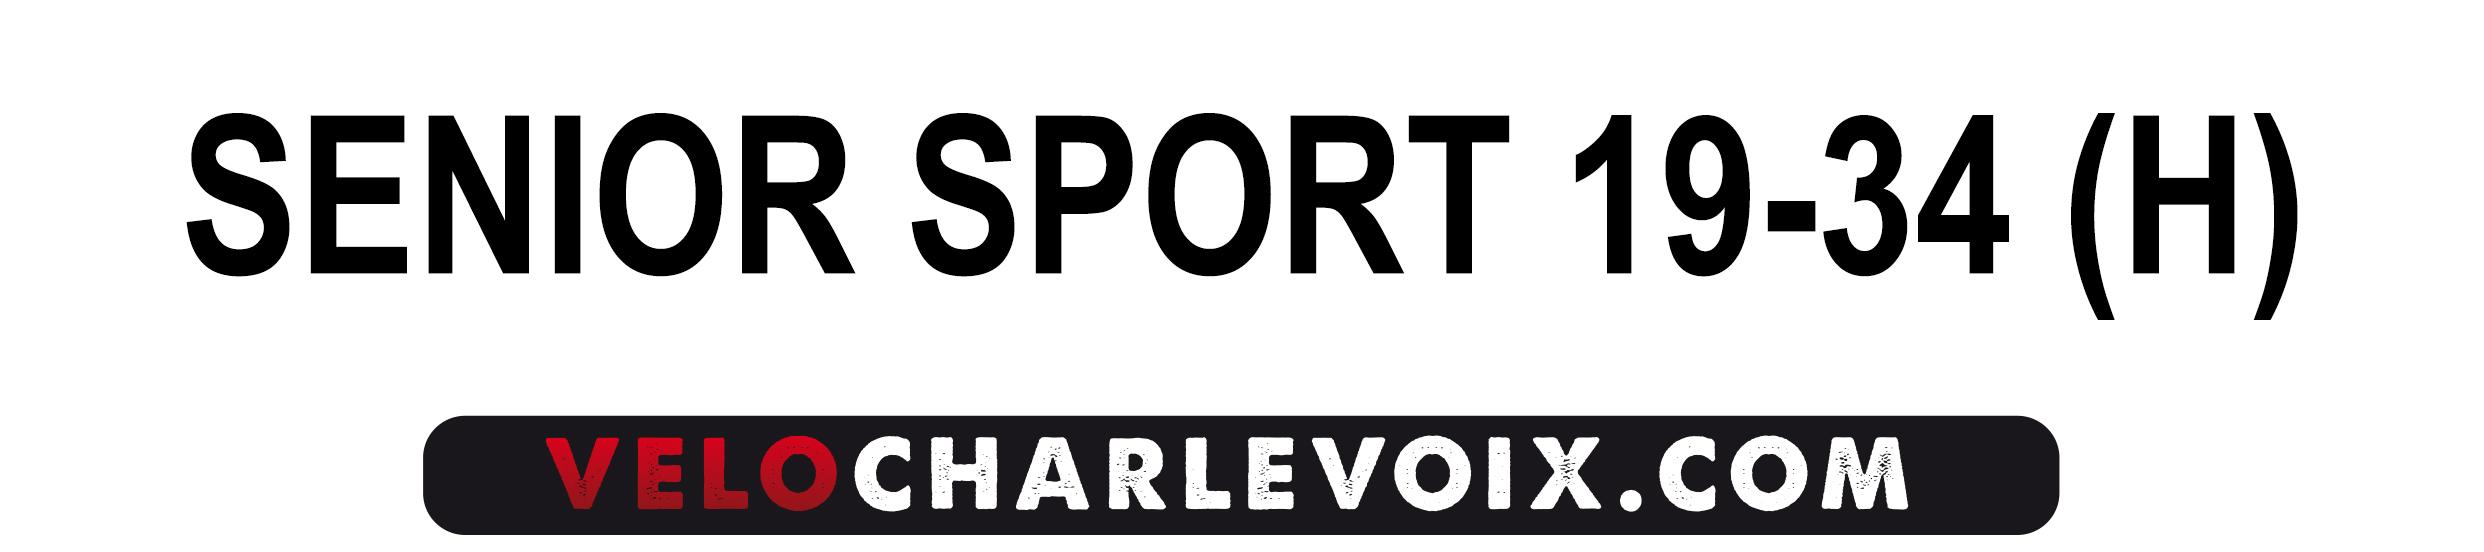 Categories Box Qc_Senior sport 19-34 H